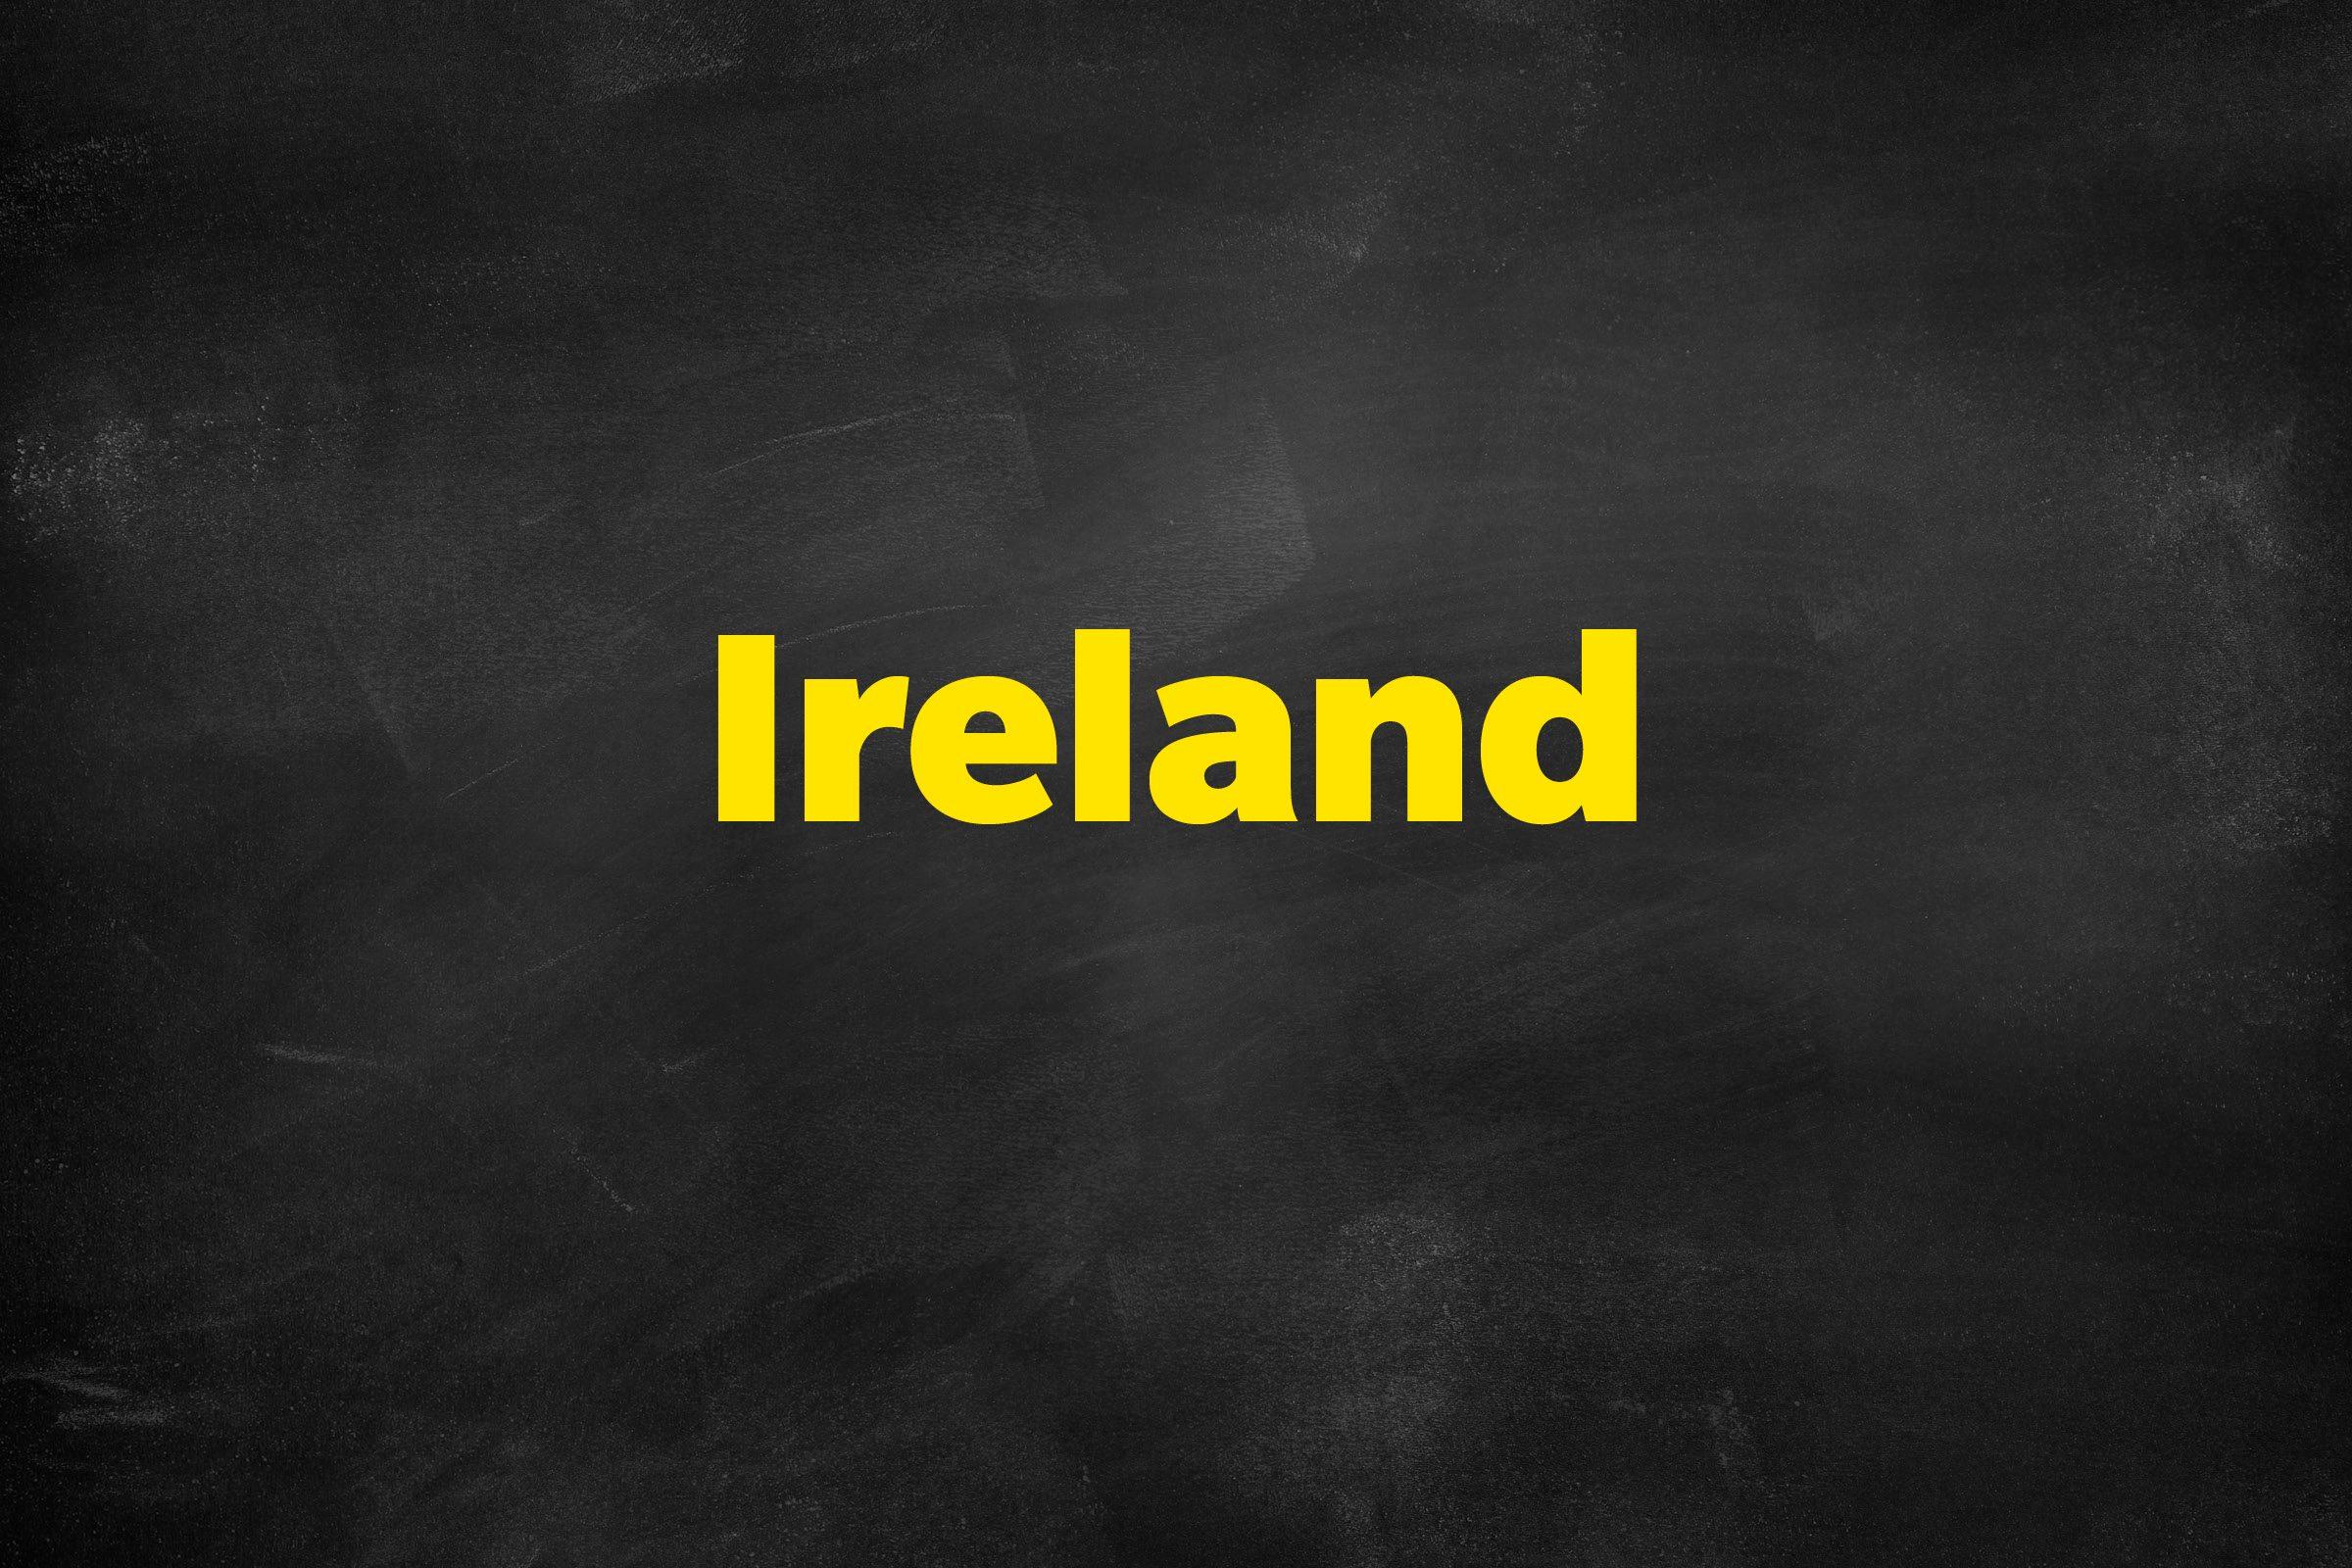 Answer: Ireland